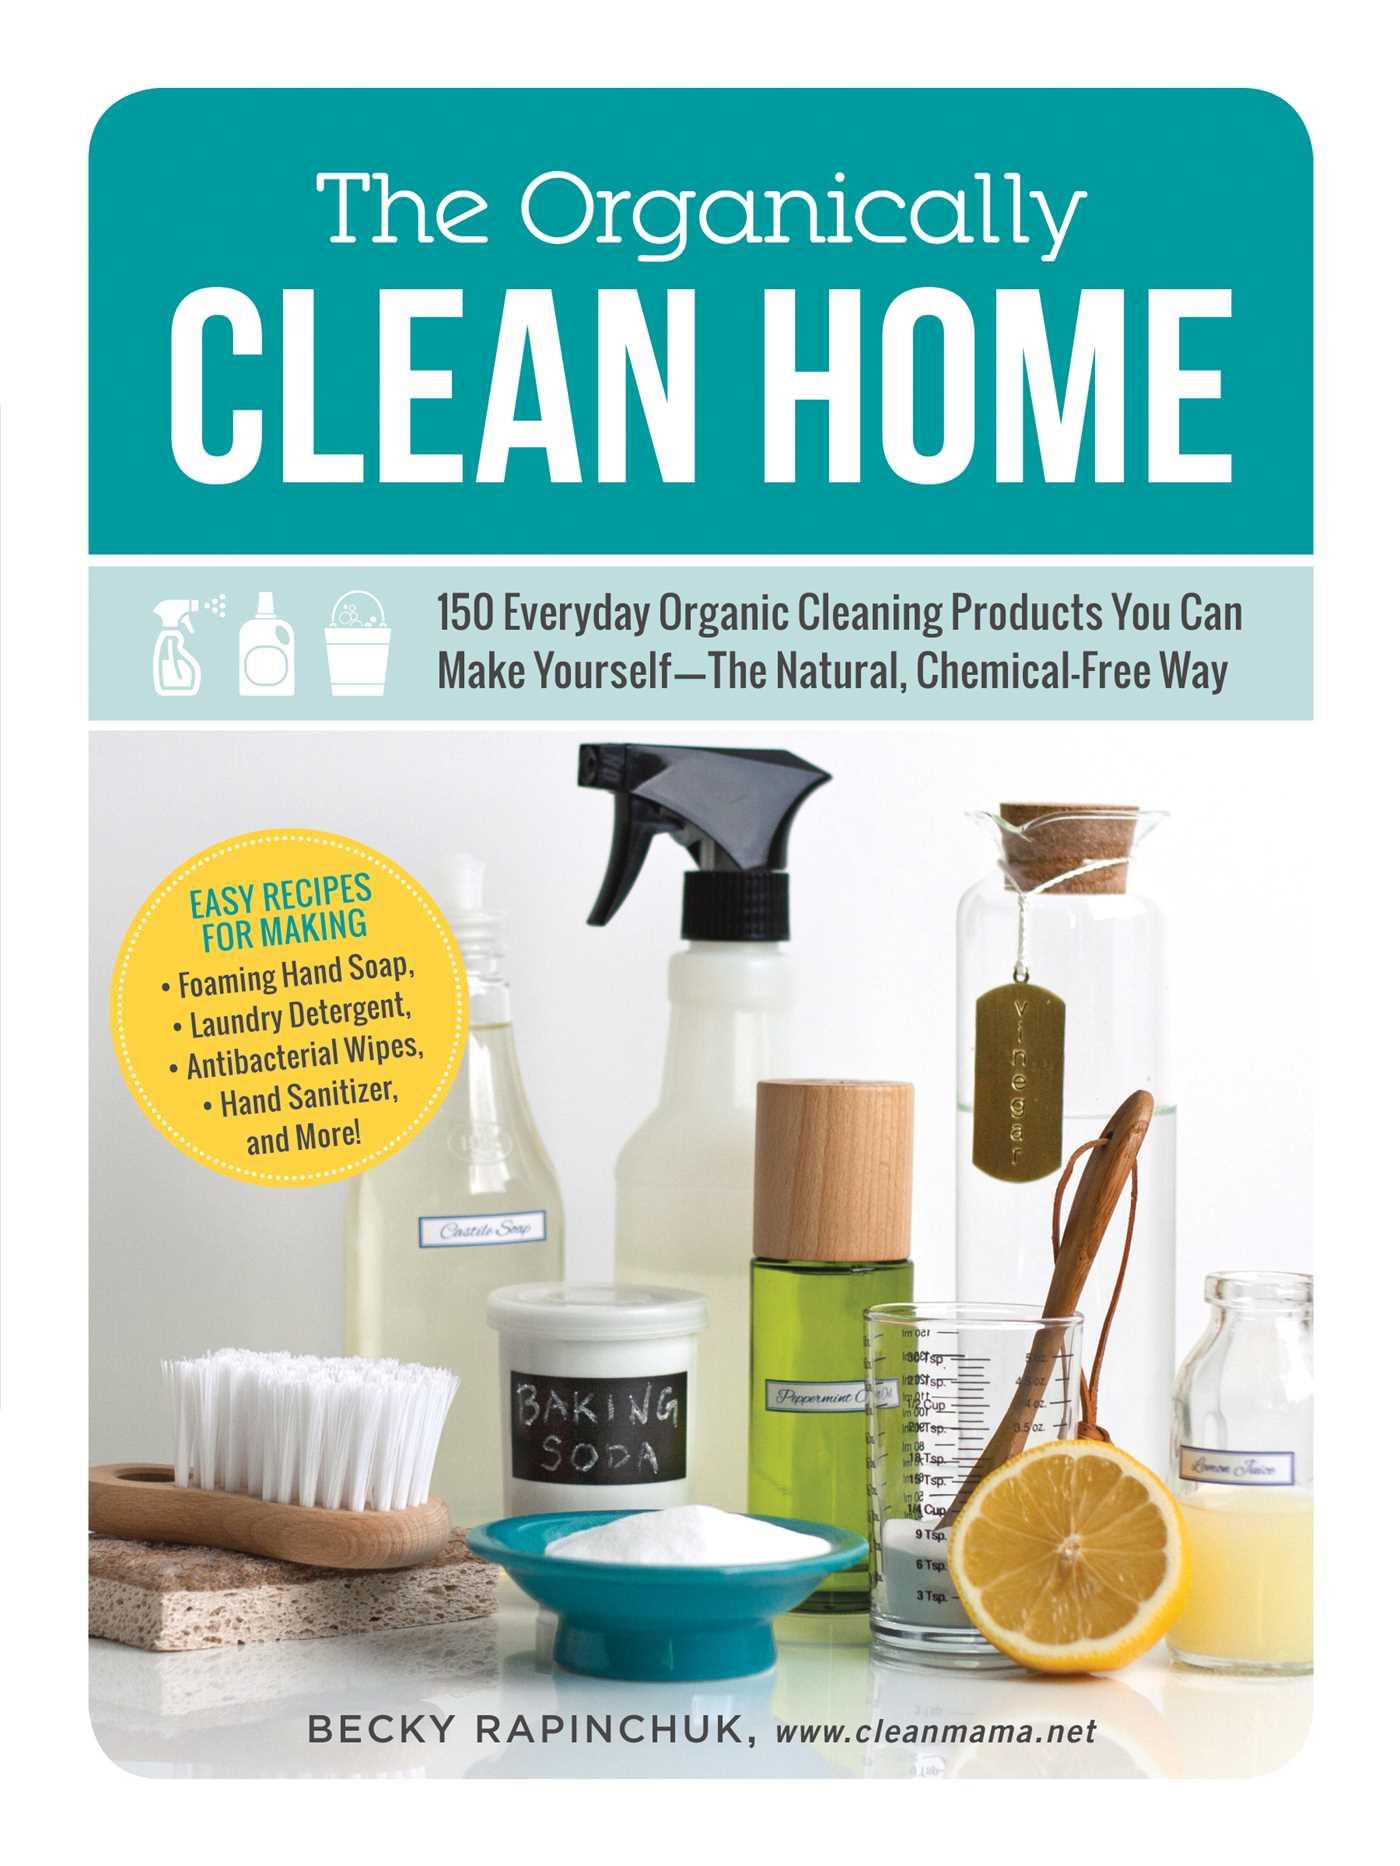 The organically clean home 9781440572517 hr